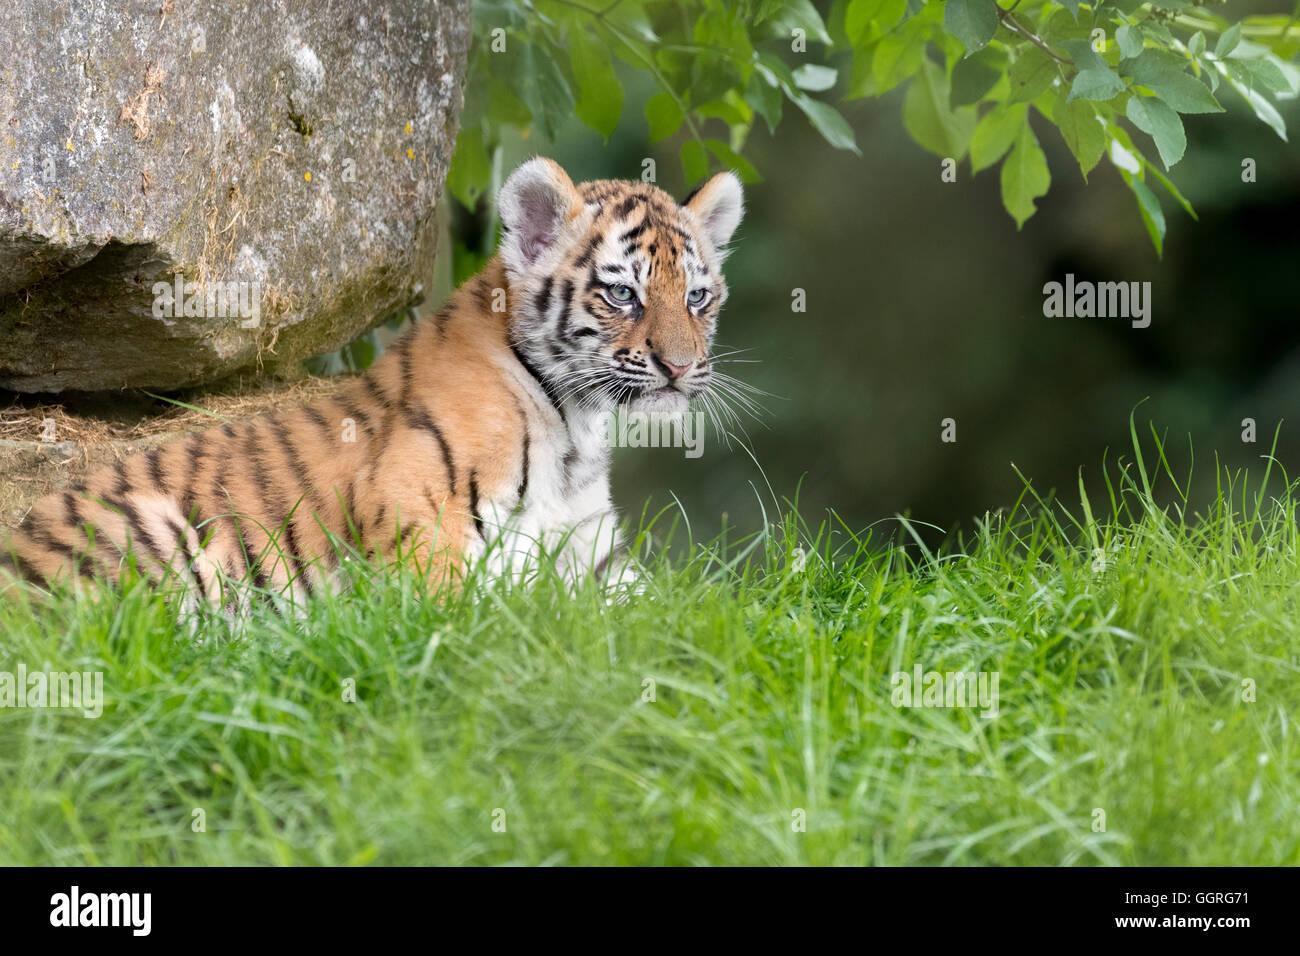 Amur tiger cub, 10 weeks old. - Stock Image